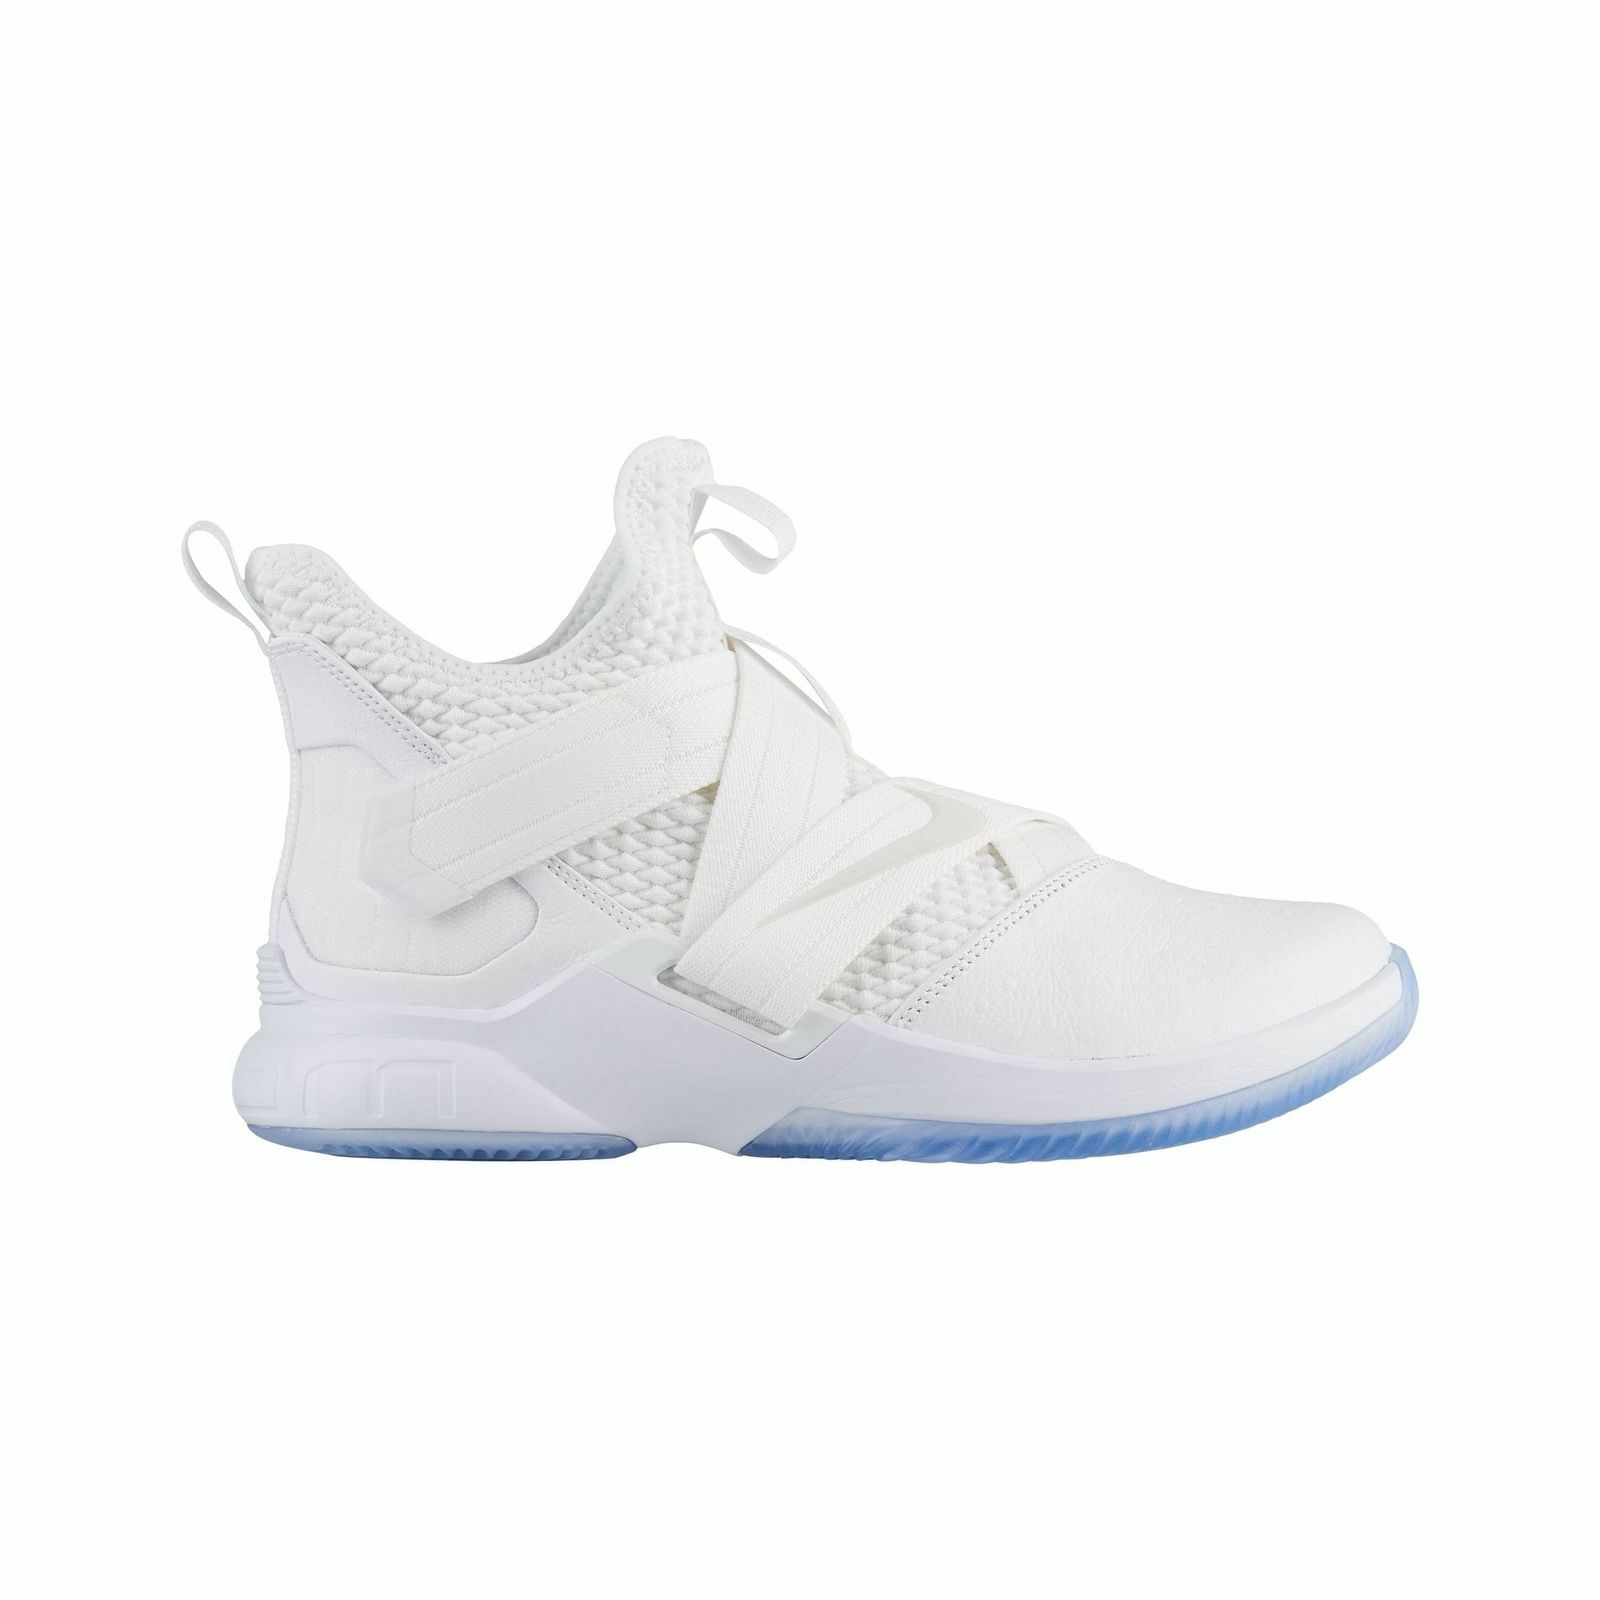 Hommes Nike Basketball Basketball Basketball Lebron Soldier XII SFG Basketball Nike blanc 807790